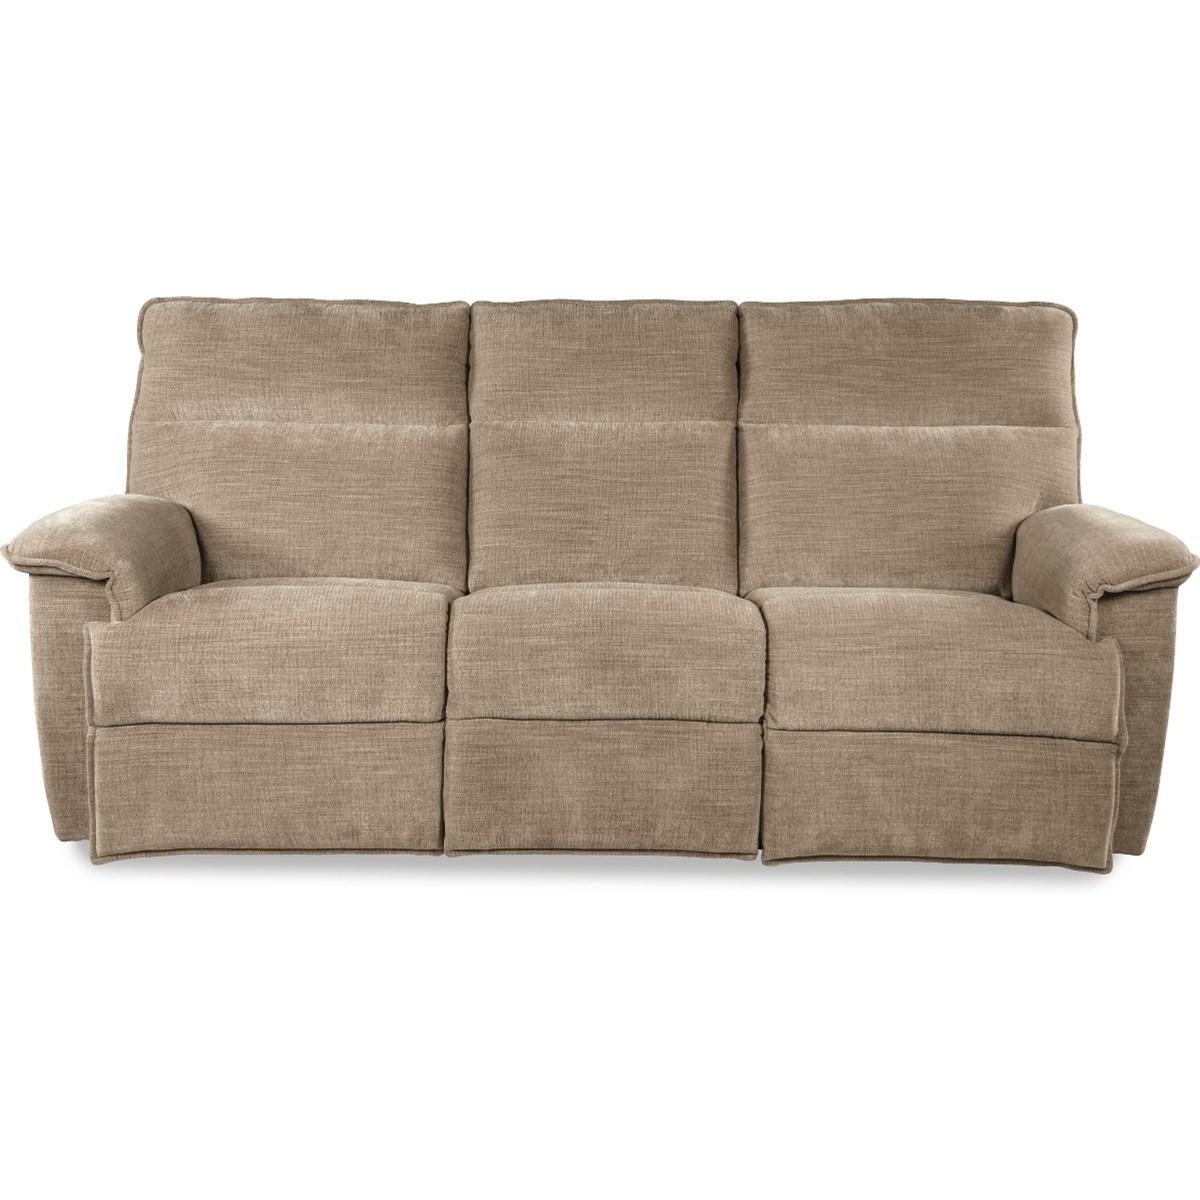 Superior La Z Boy JayLa Z Time Full Reclining Sofa ...